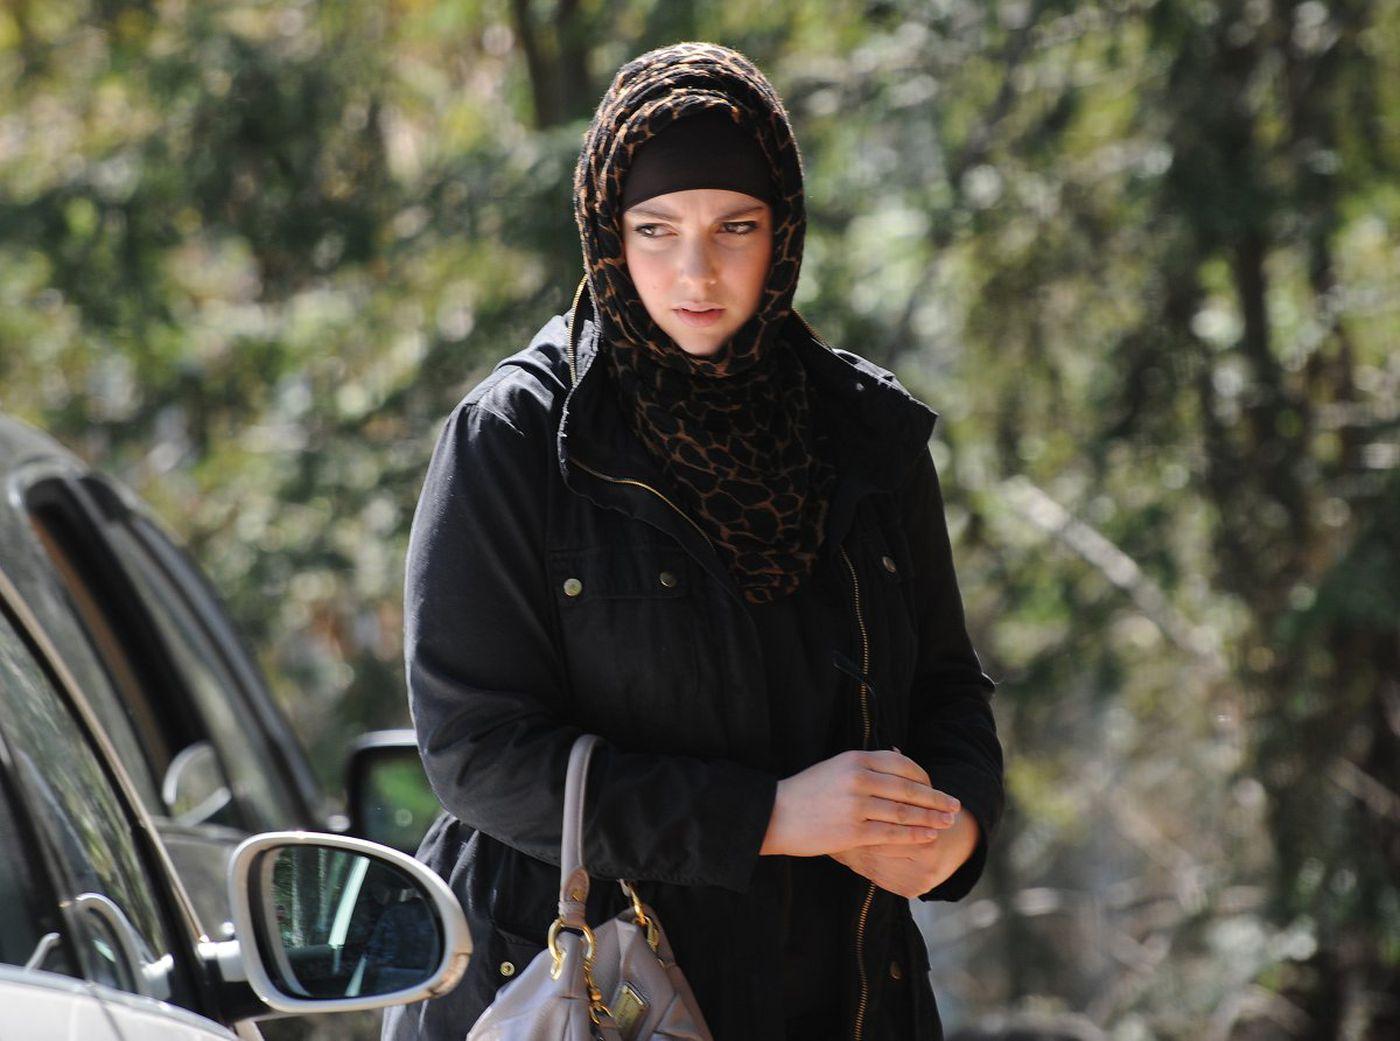 And Cat Tsarnaev Katherine Russell